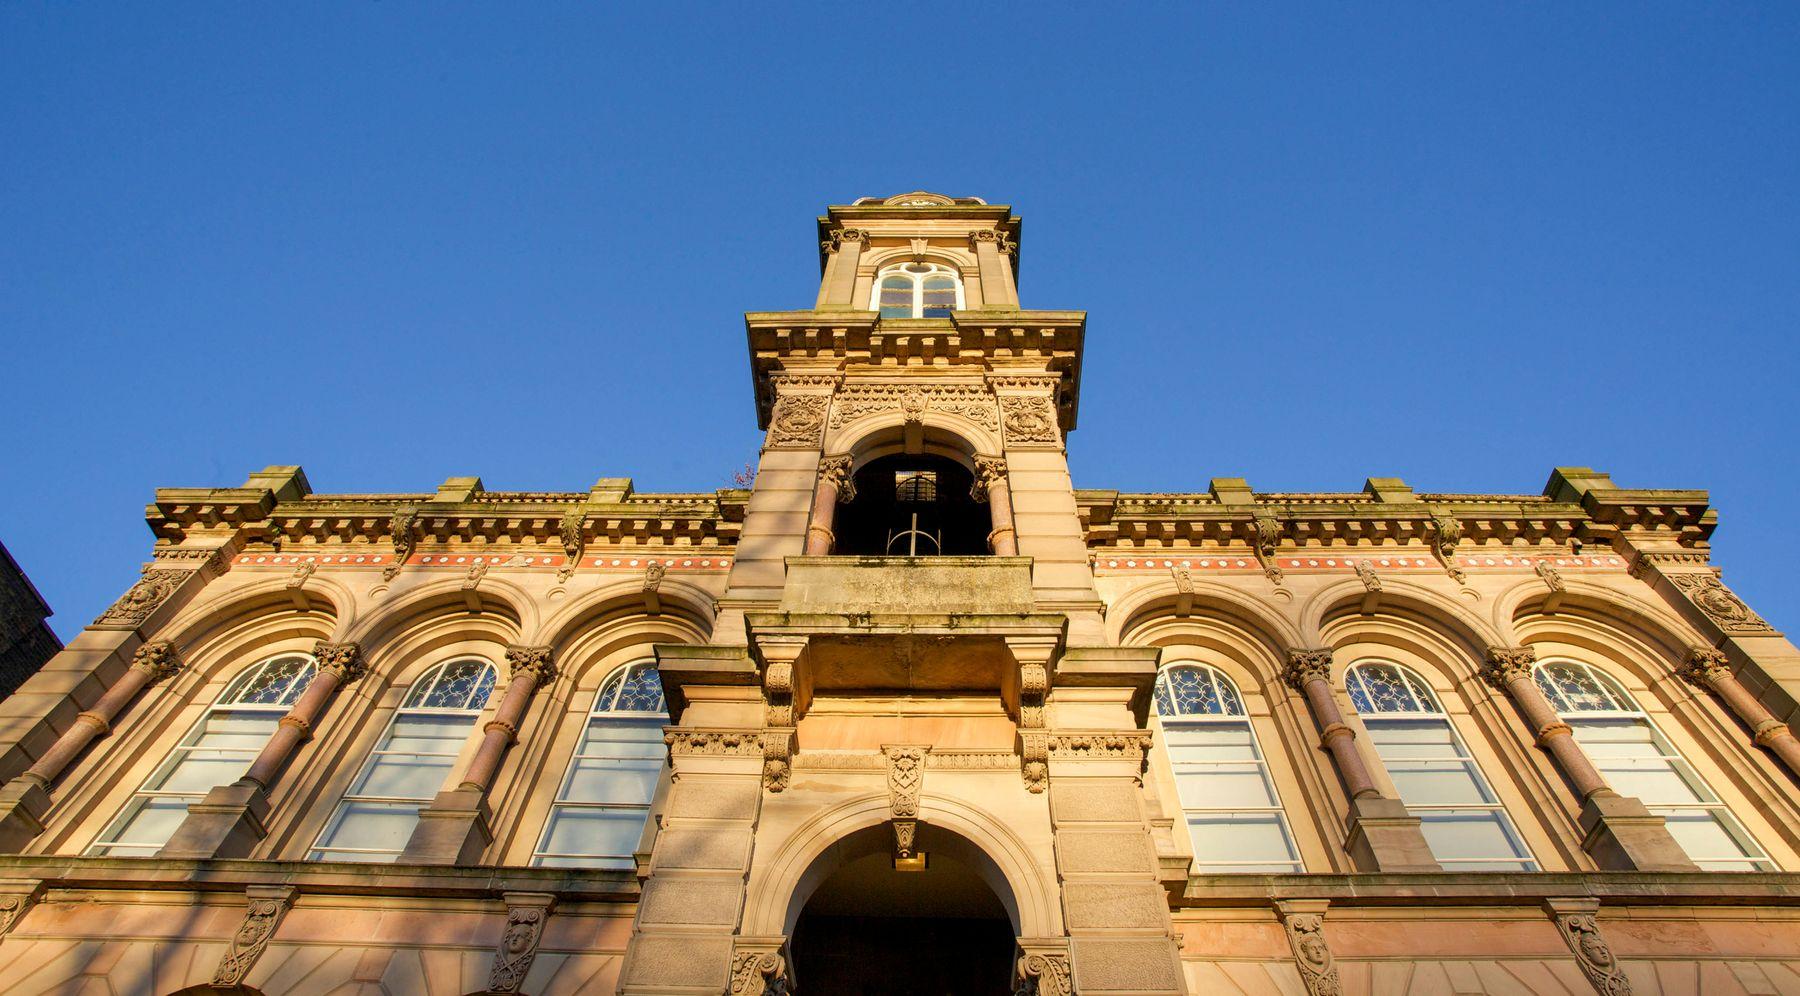 Waverley building